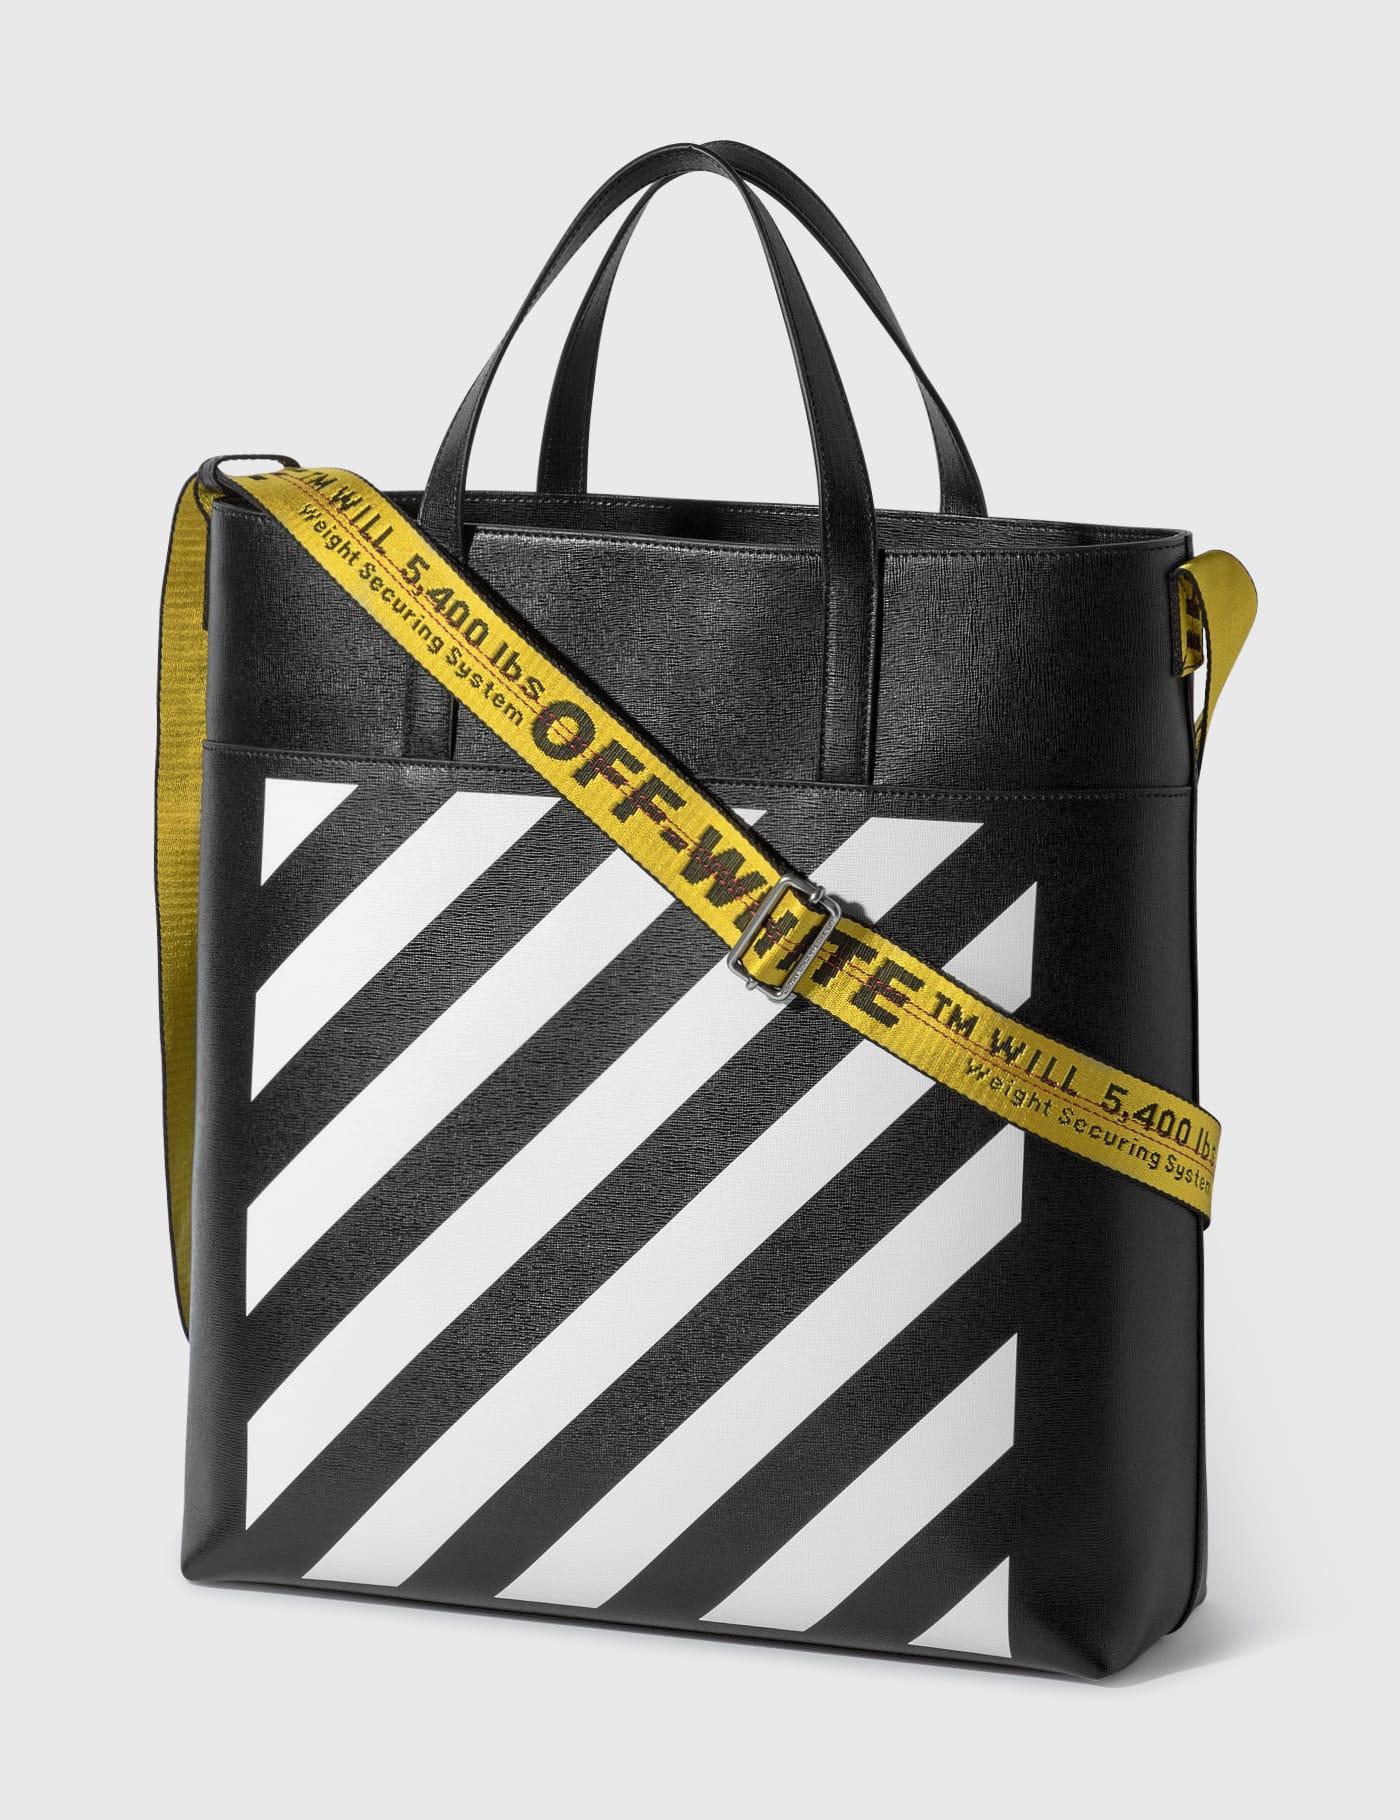 Diag Leather Tote Bag